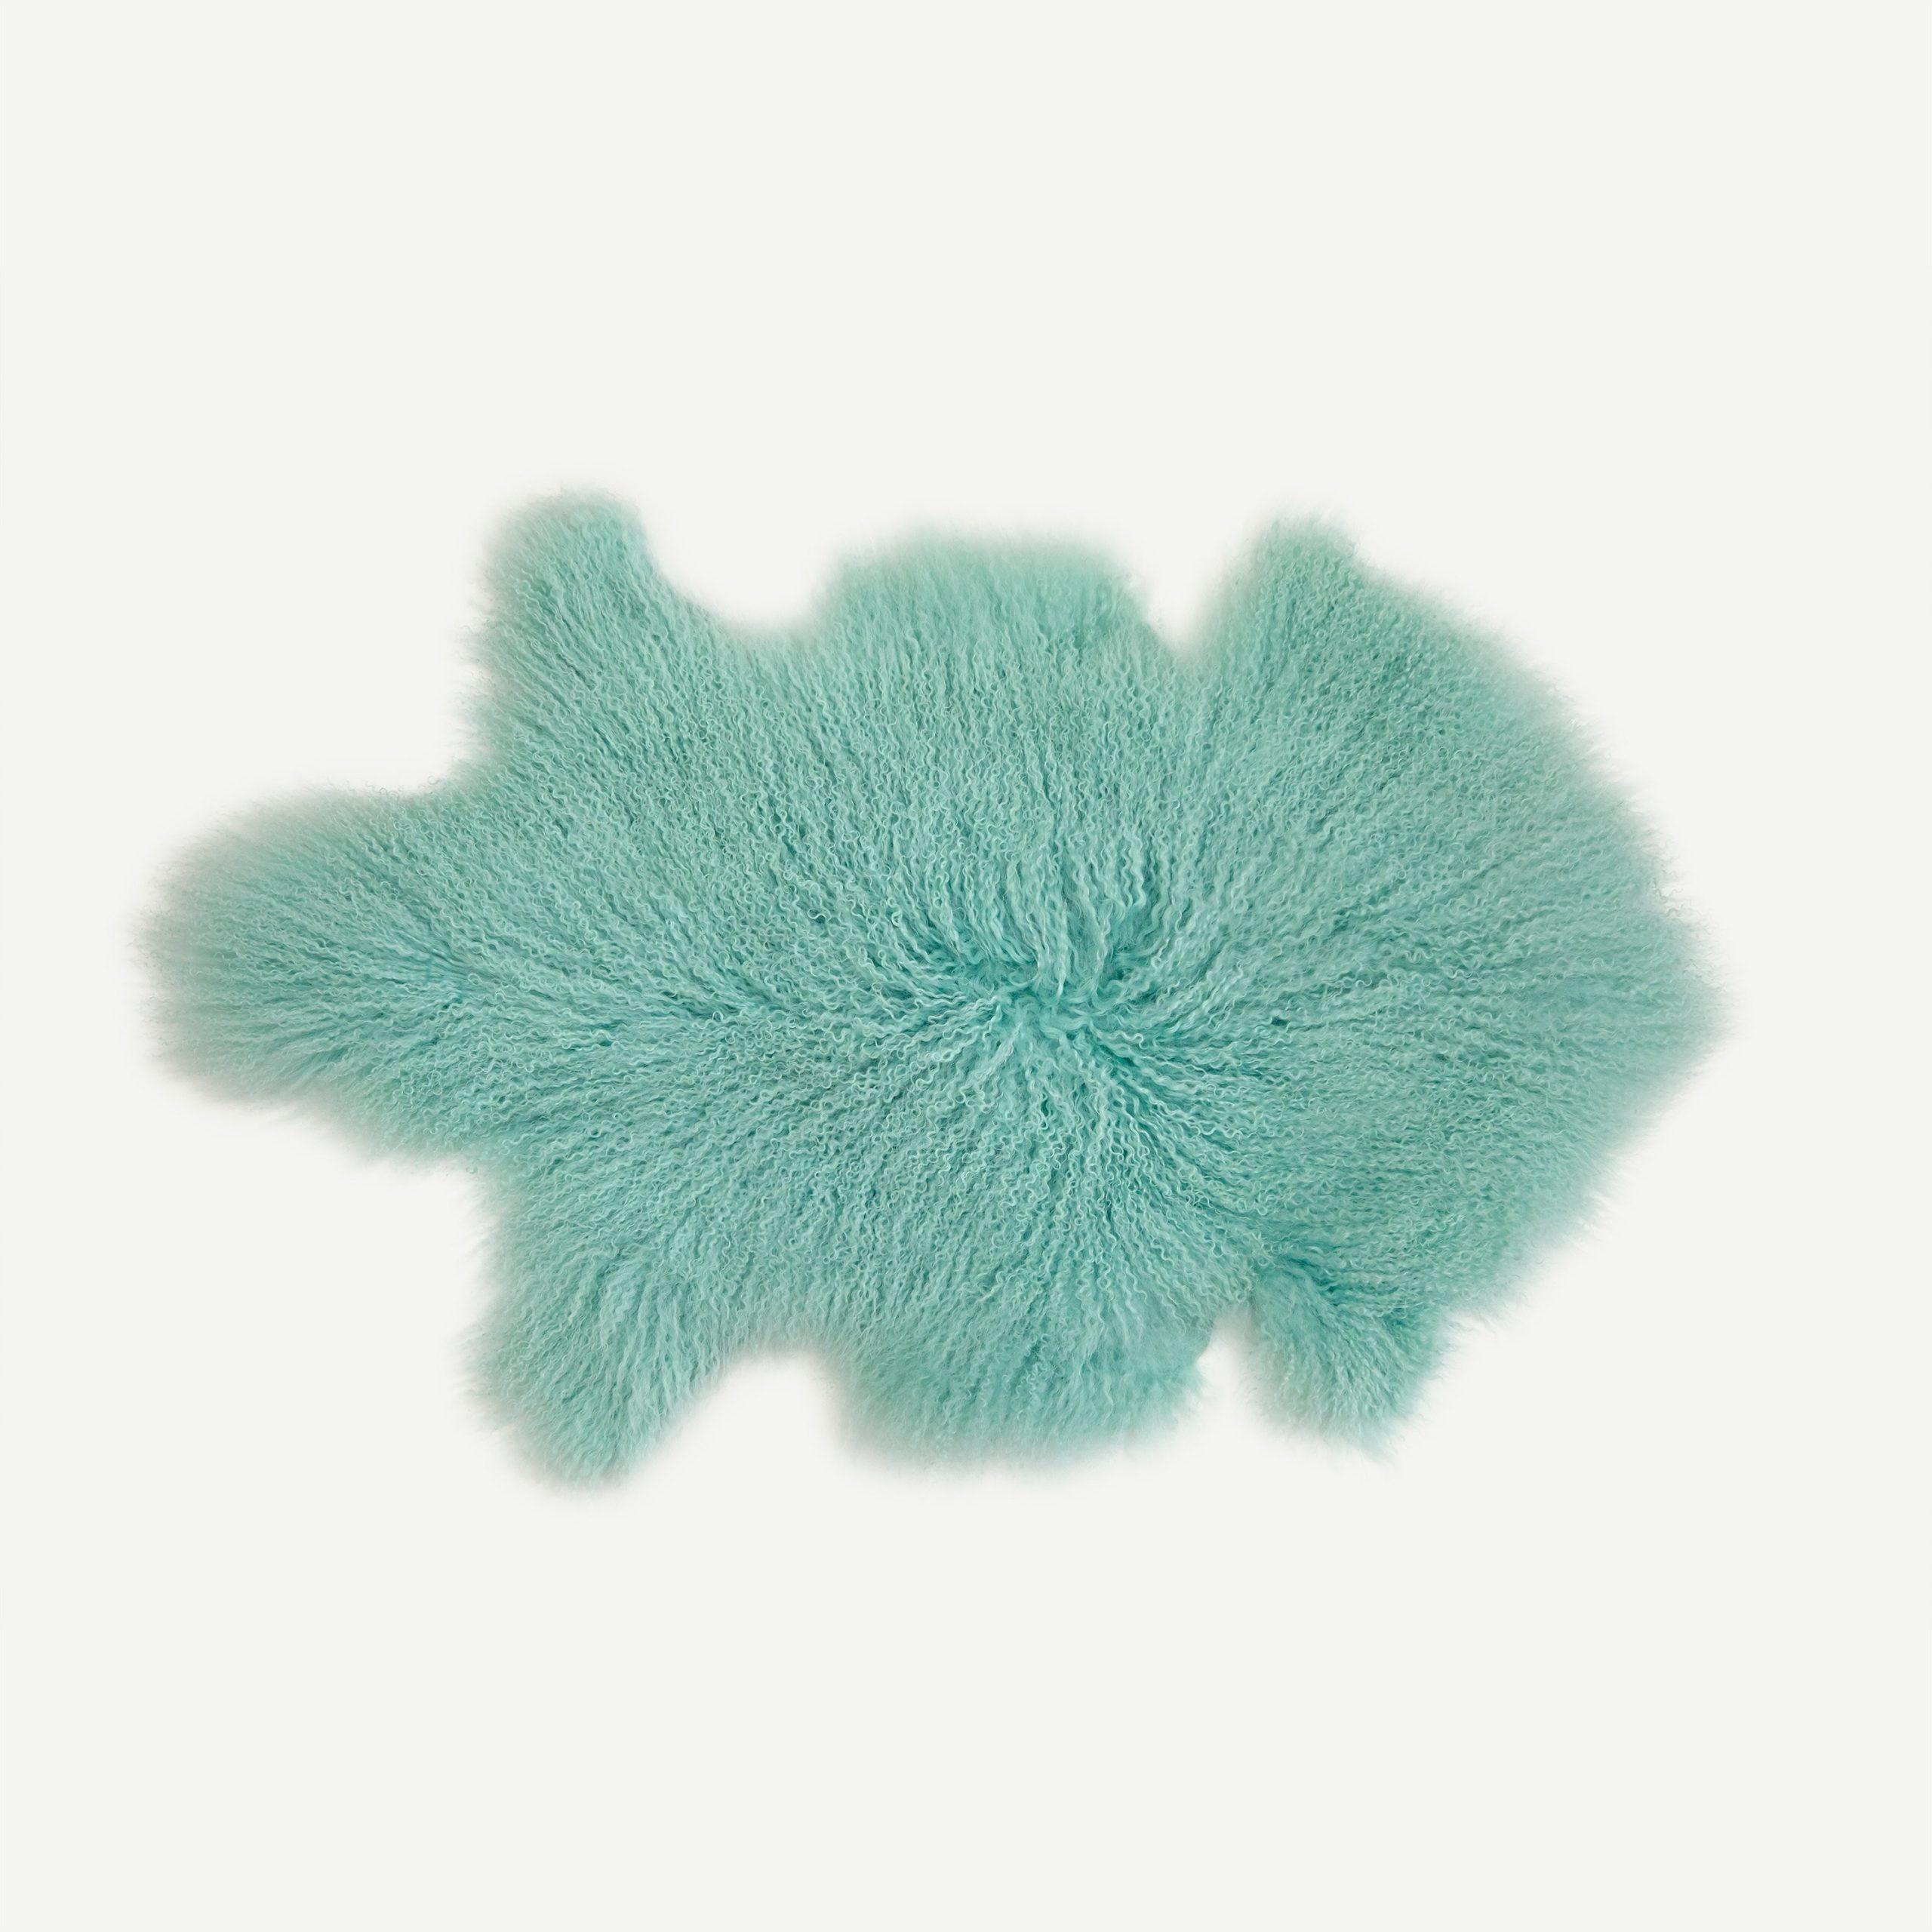 Mint Tibetan Sheepskin Rug